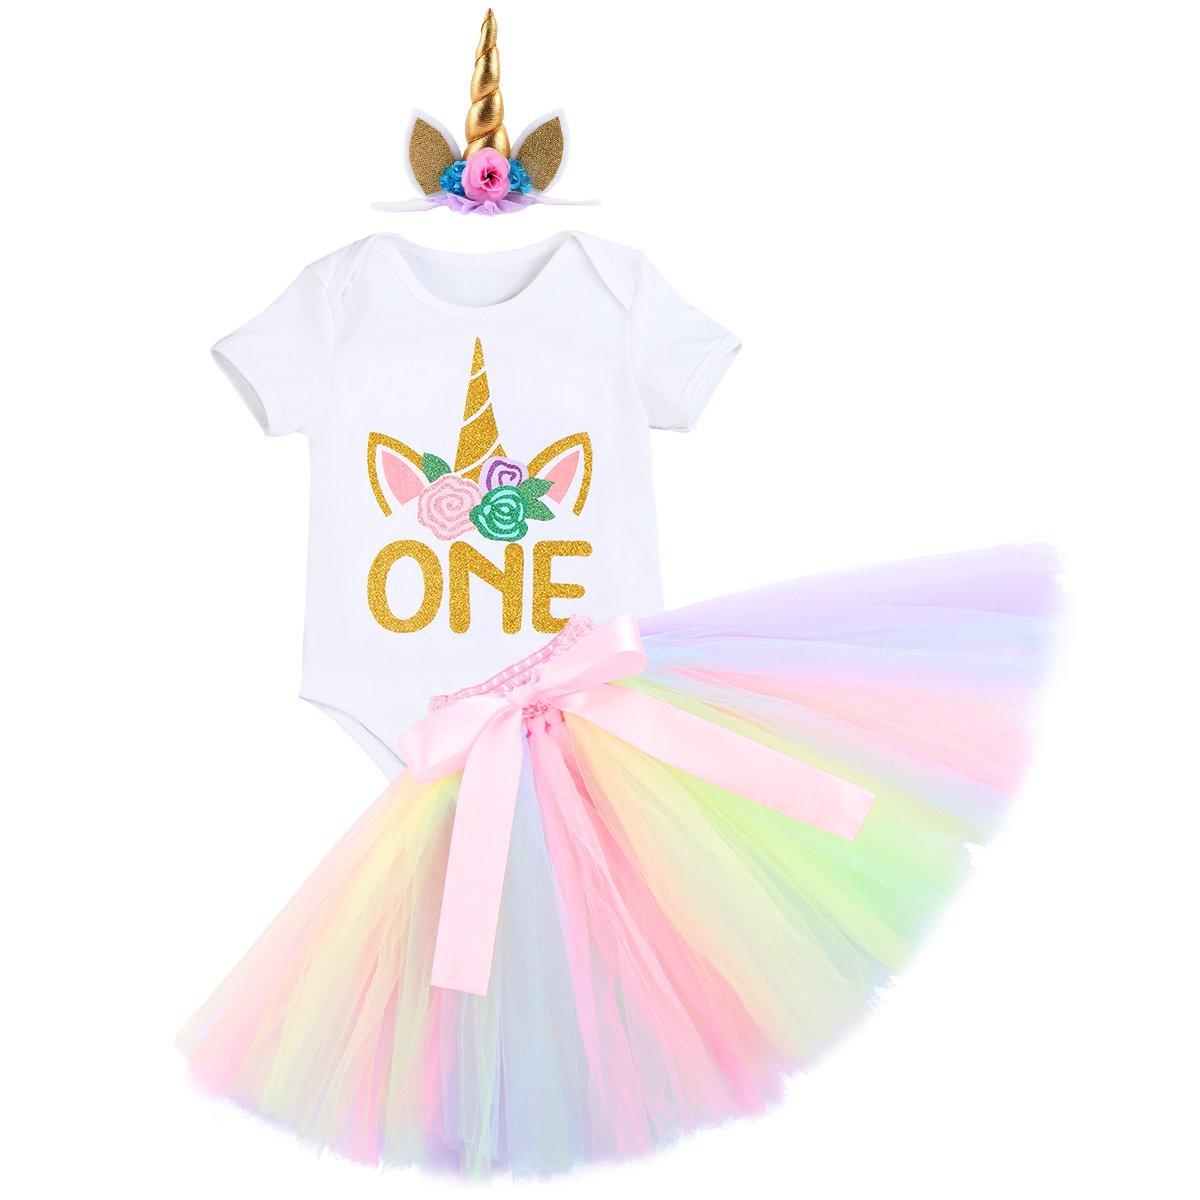 OBEEII Baby Girl Unicorn Romper Tutu Skirt Headband Outfits First Birthday Cake Smash